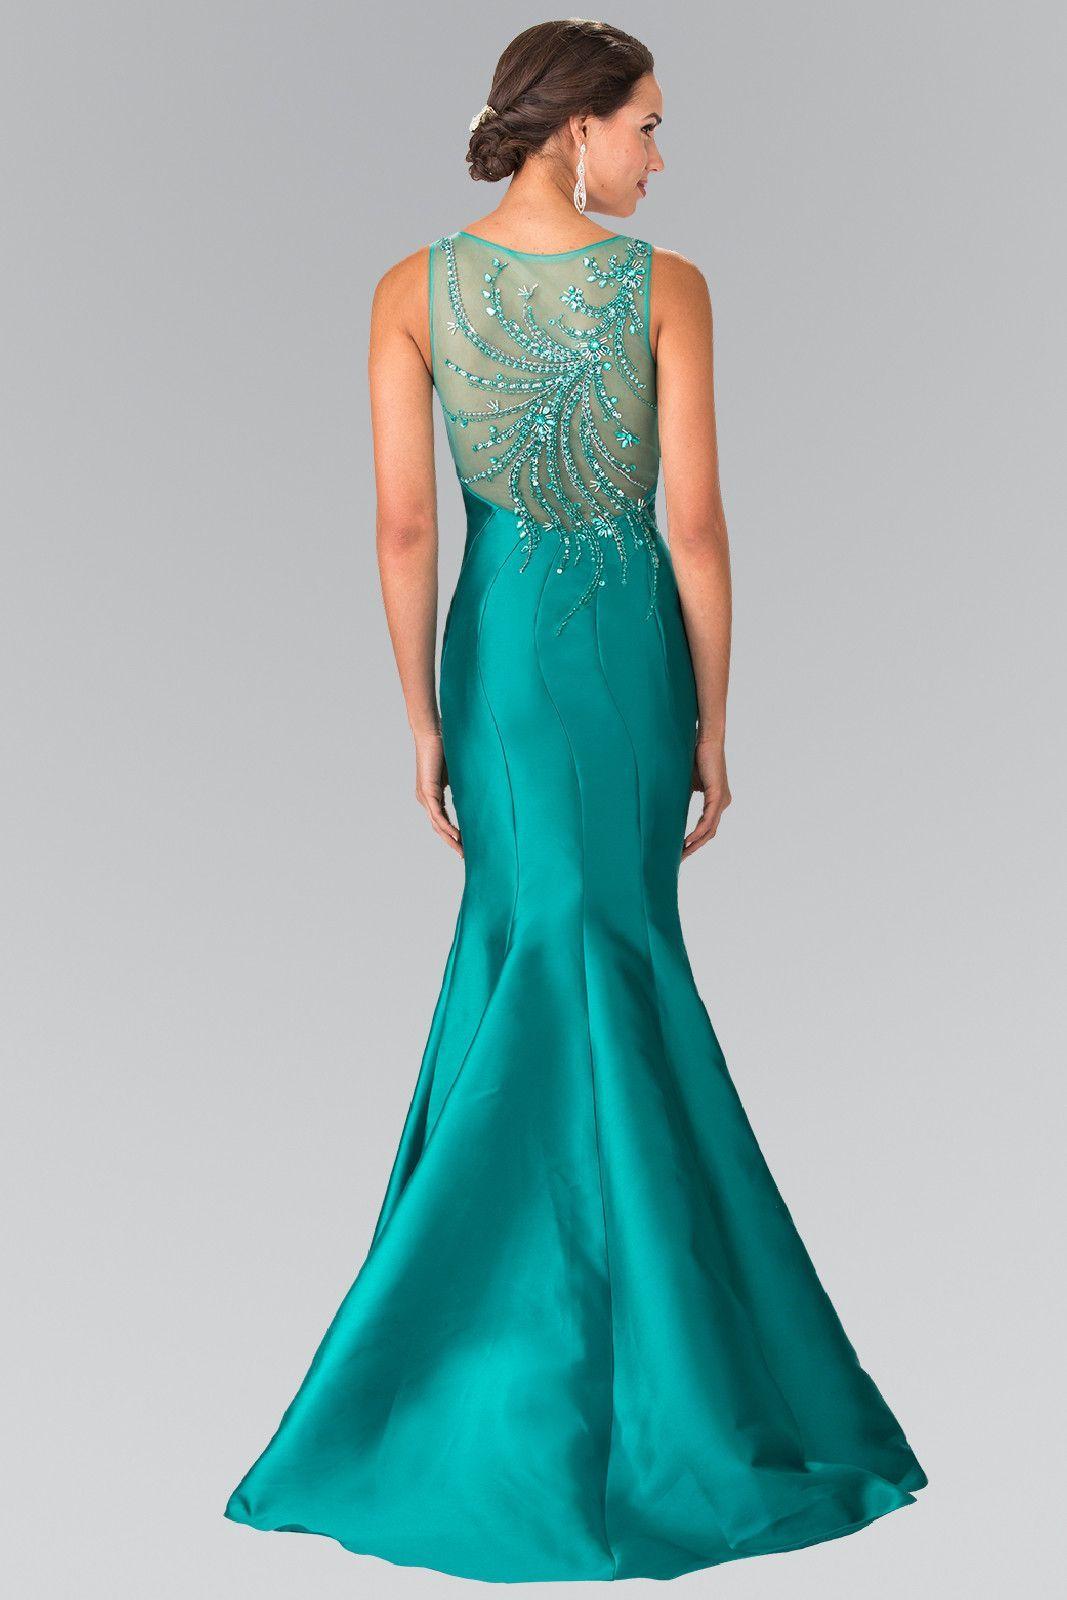 Mikado beaded runway mermaid prom dress trumpet evening gown xs